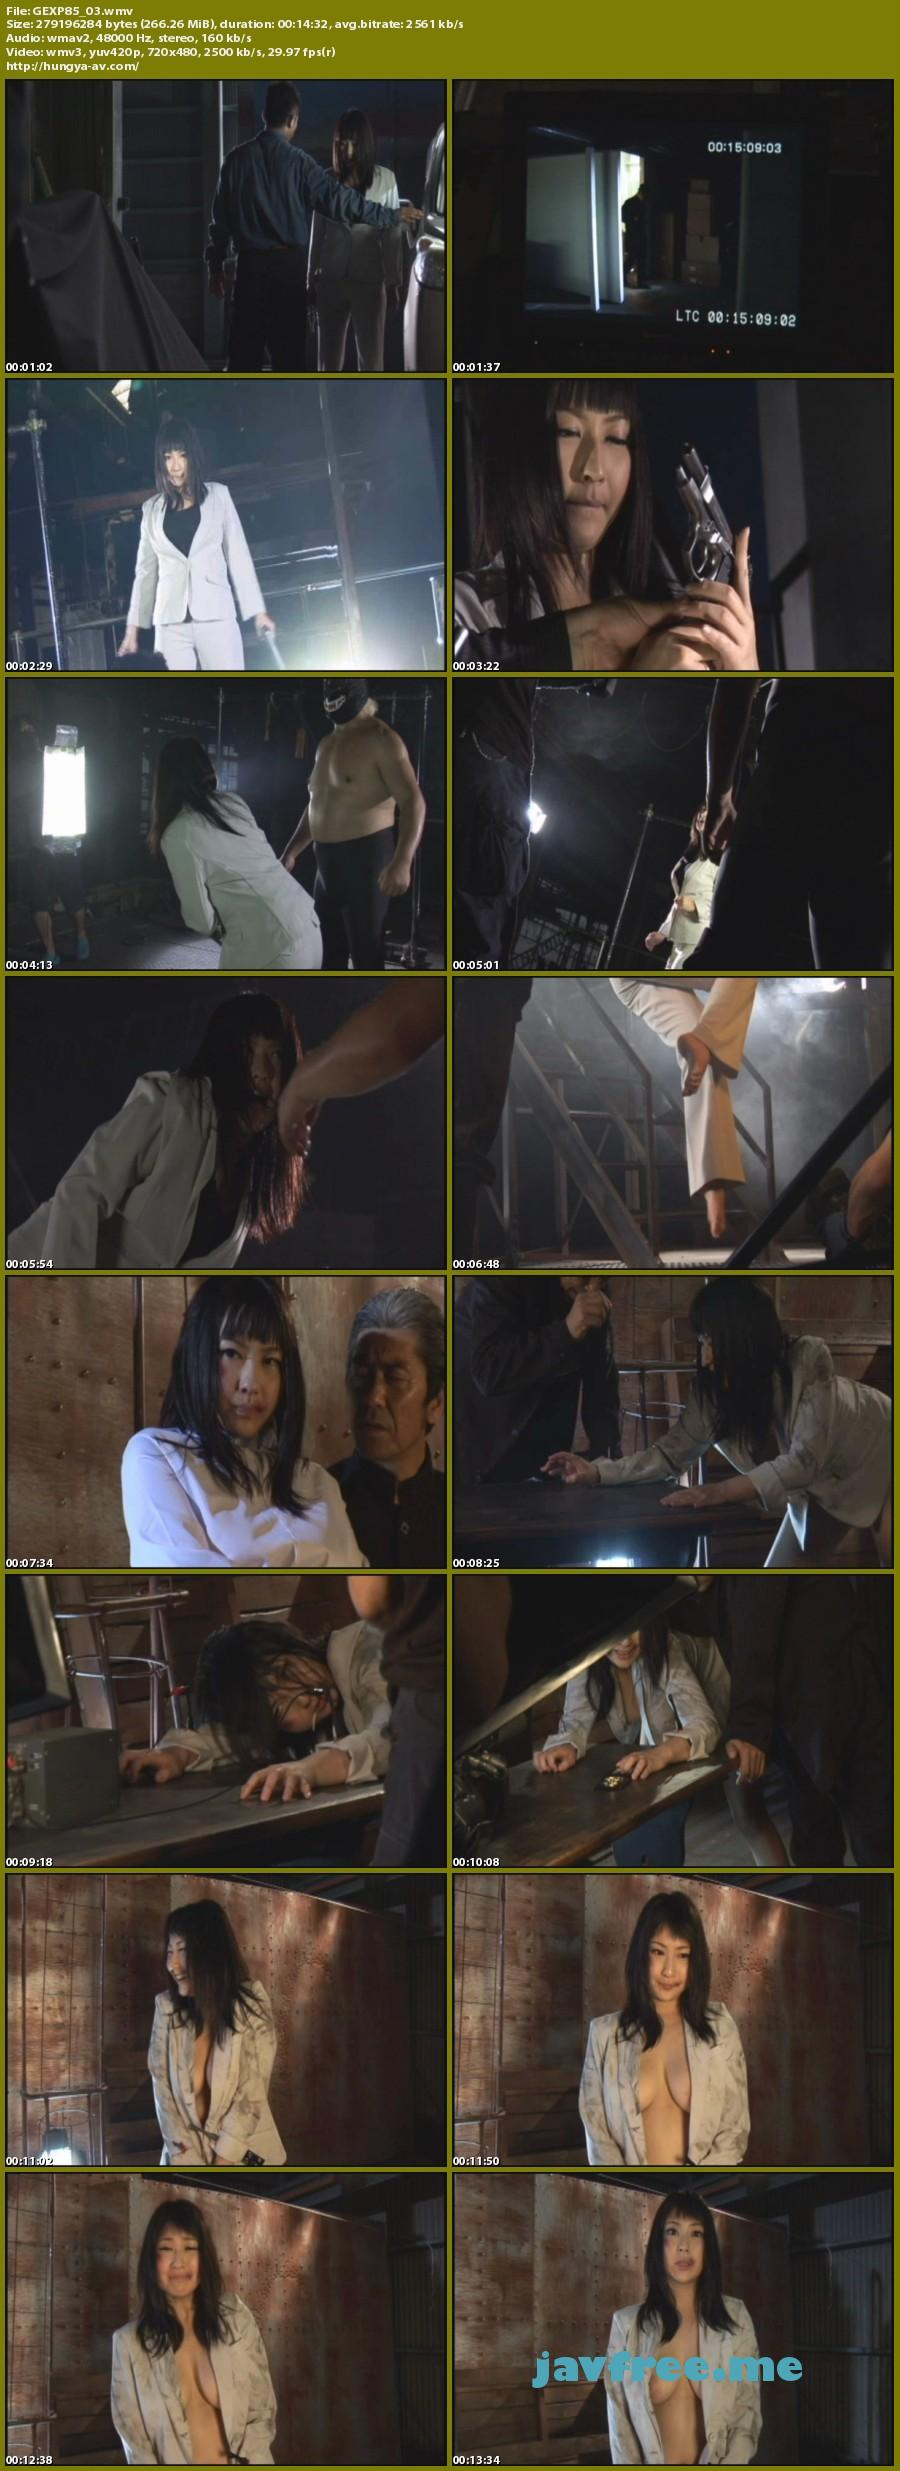 [GEXP 85] 女捜査官拷問凌辱 遥めぐみ Megumi Haruka GIGA 遥めぐみ Megumi Haruka GIGA